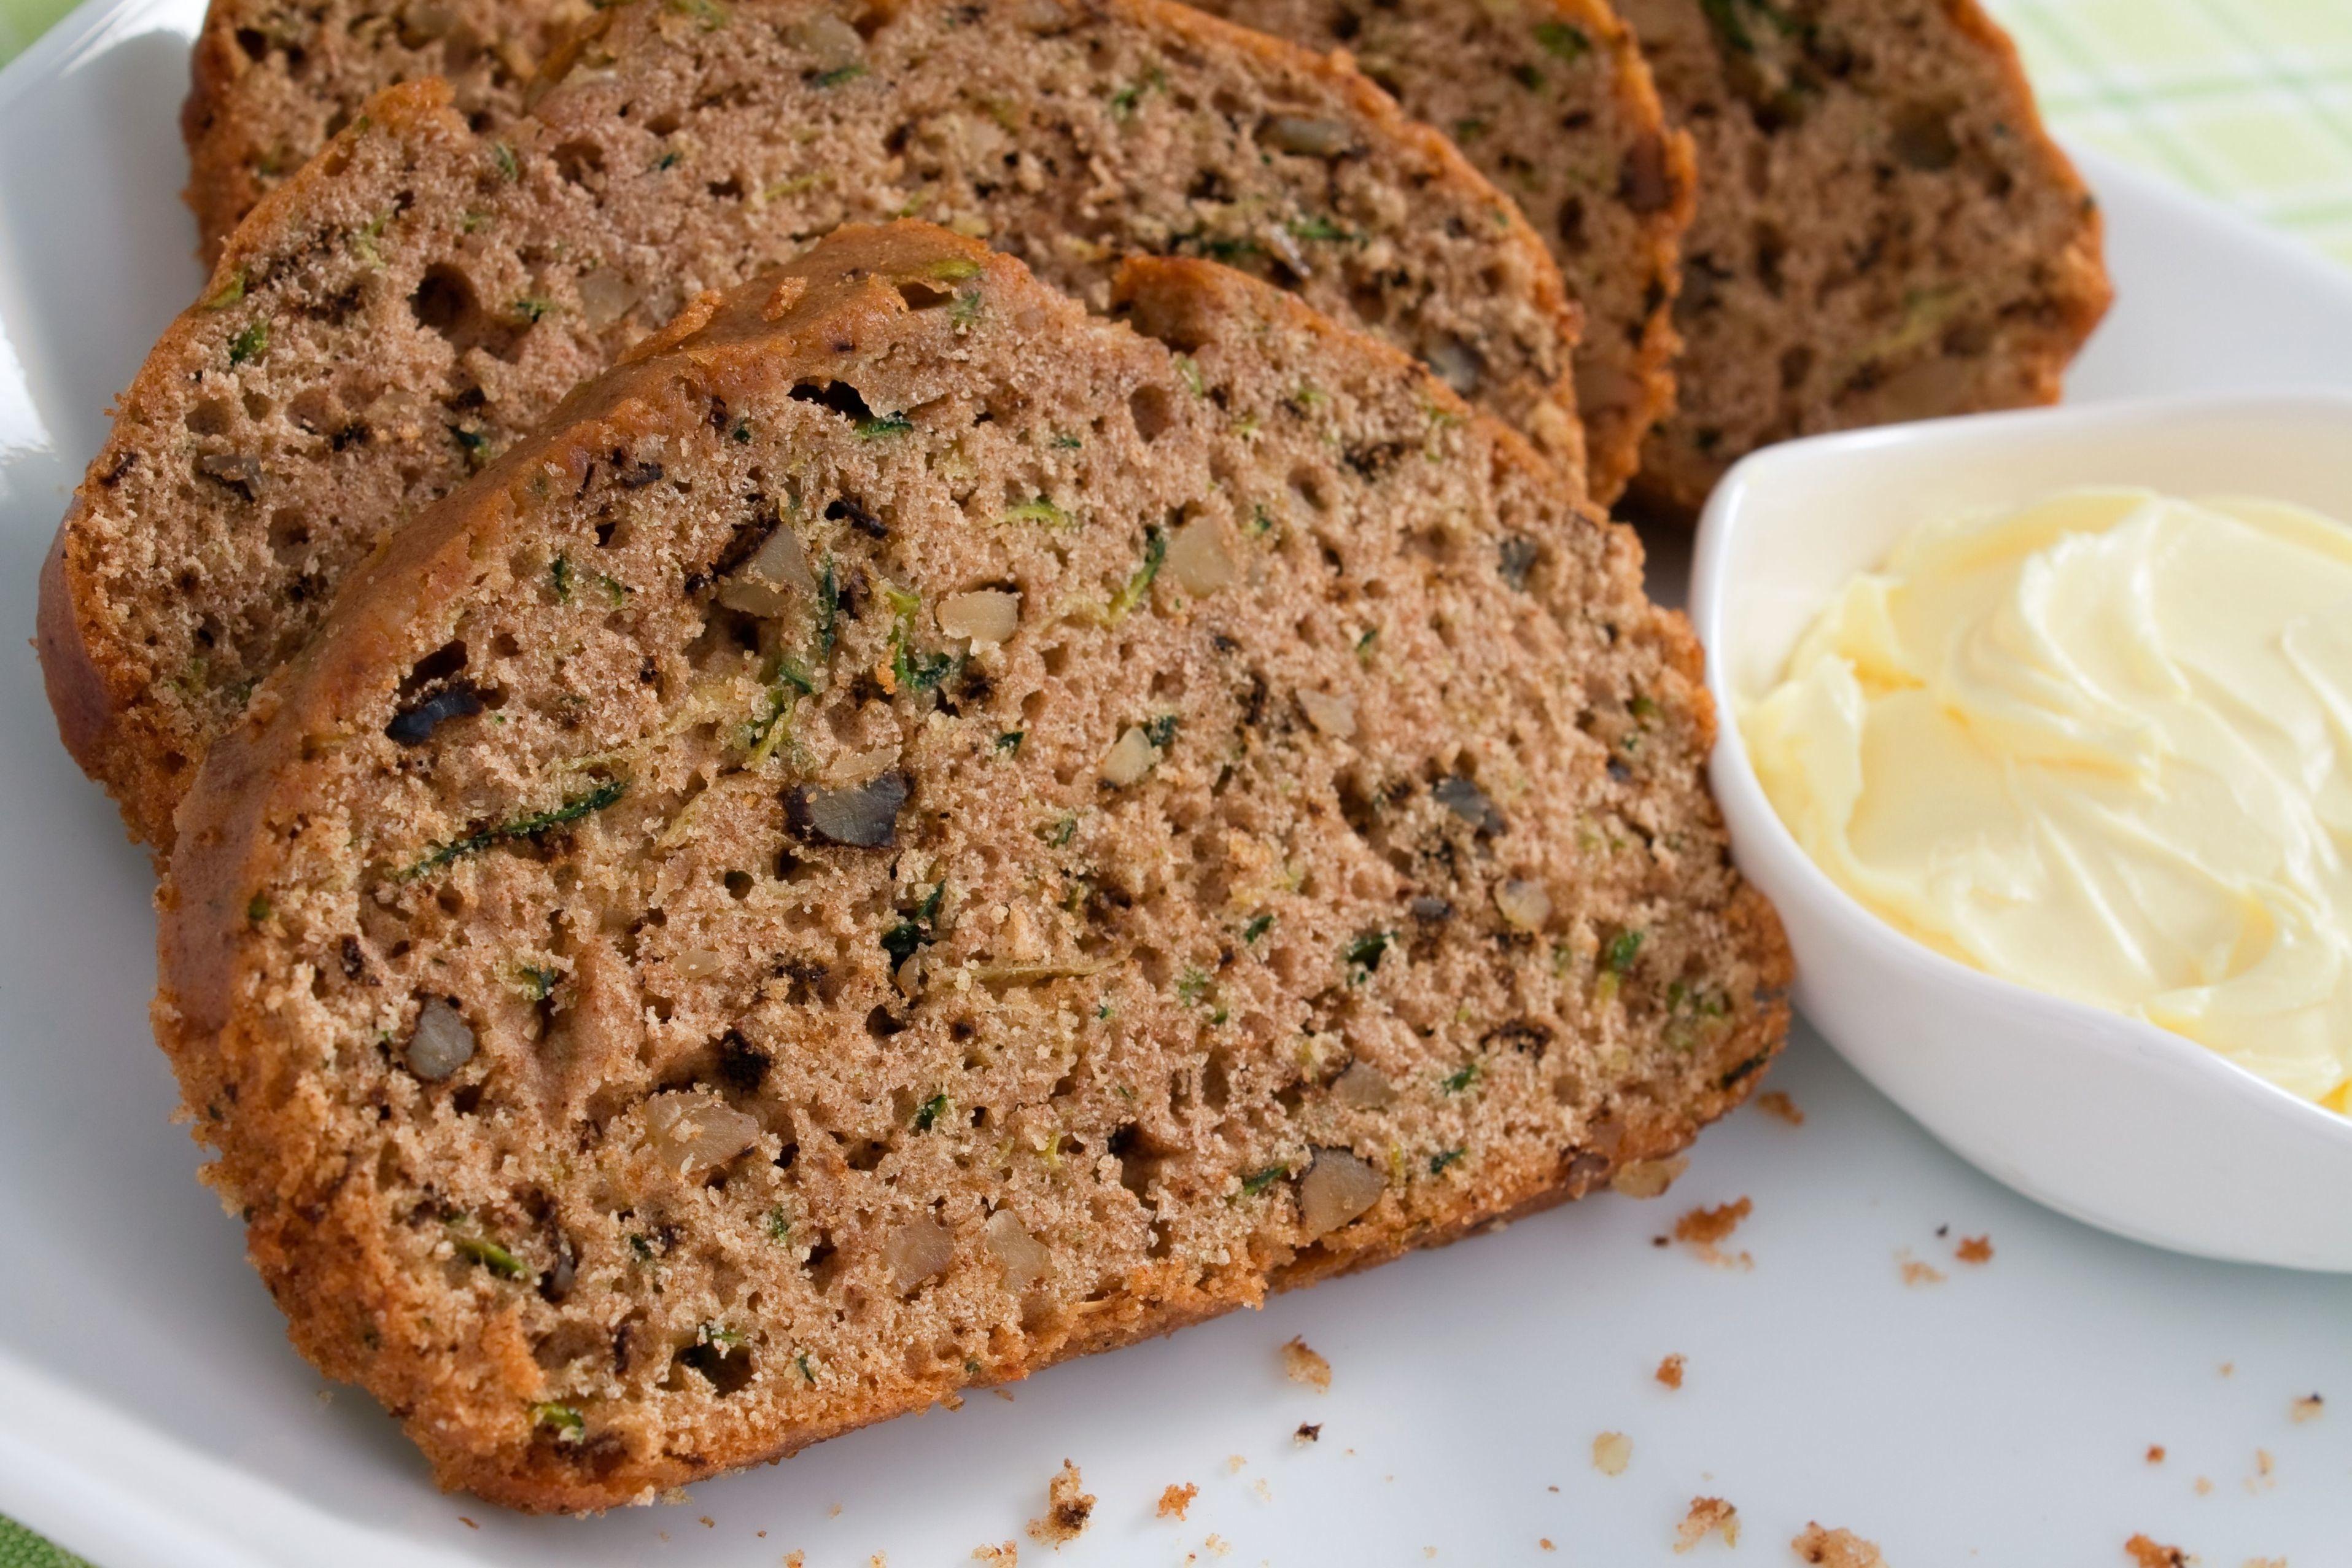 Zucchini bread clipart clipart transparent download Zucchini bread recipe - ClipartFest clipart transparent download